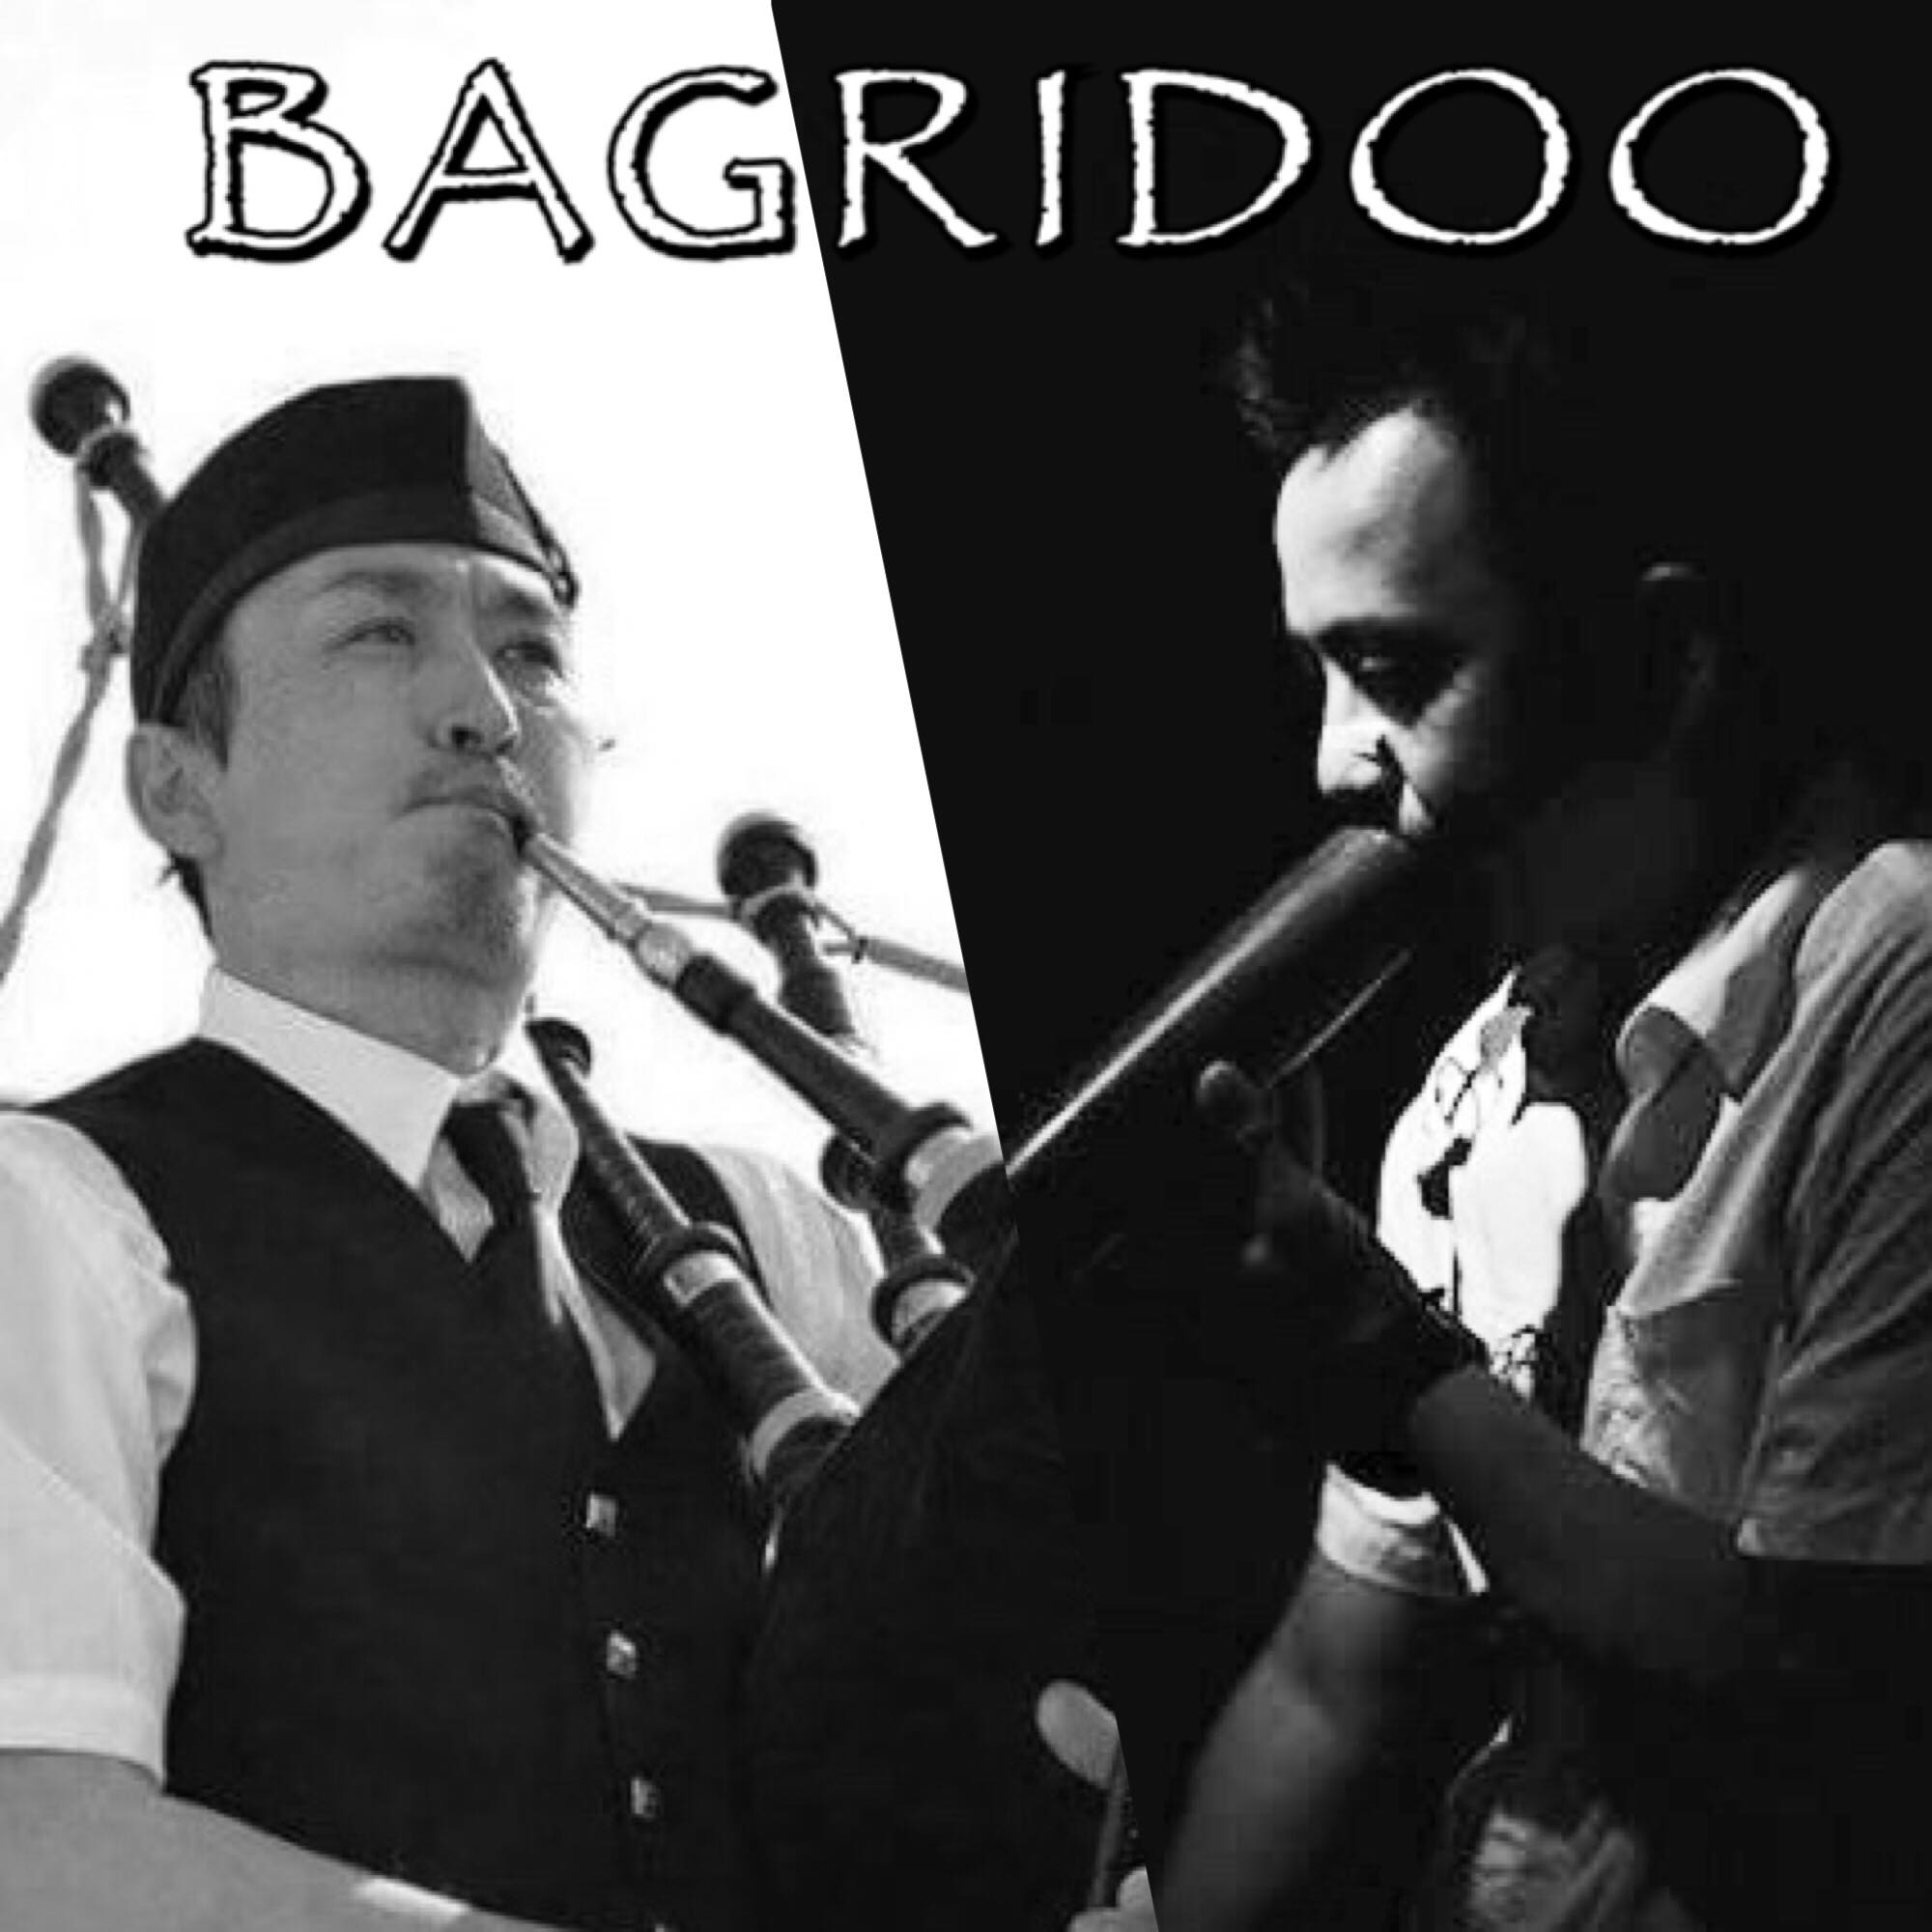 BAGRIDOO